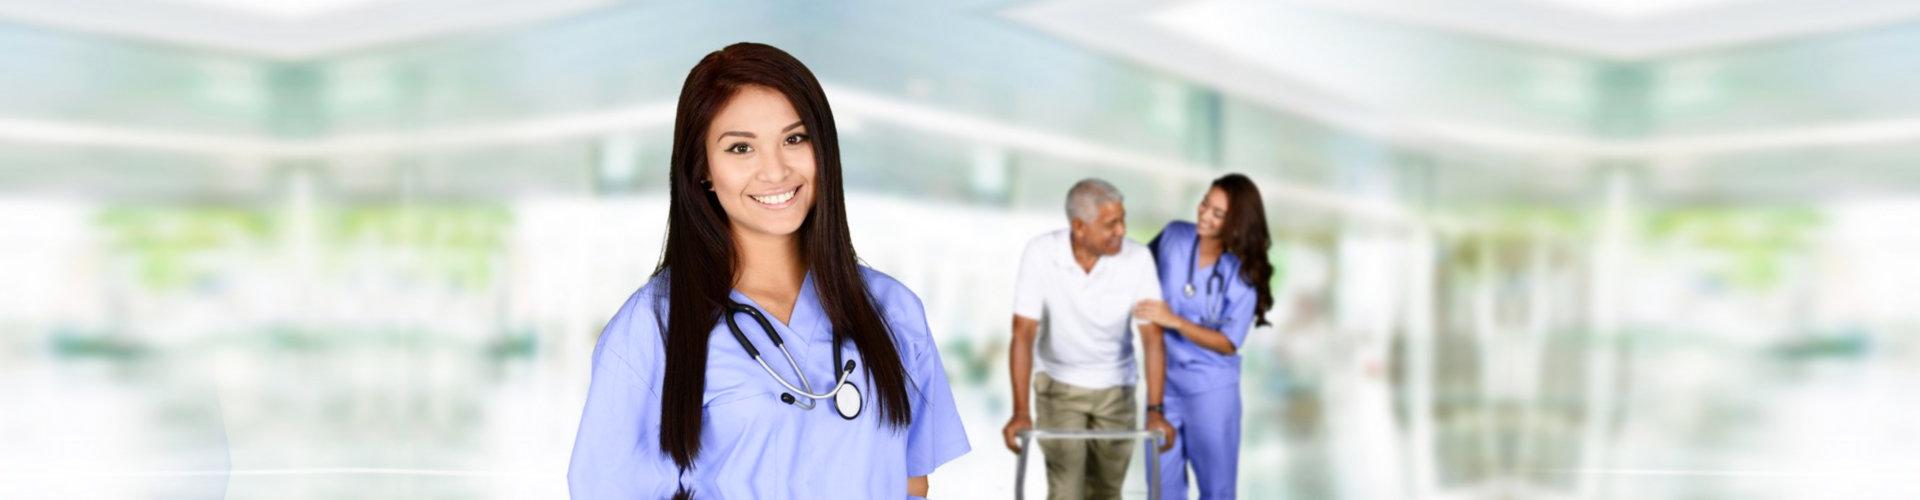 nurse woman helping senior man